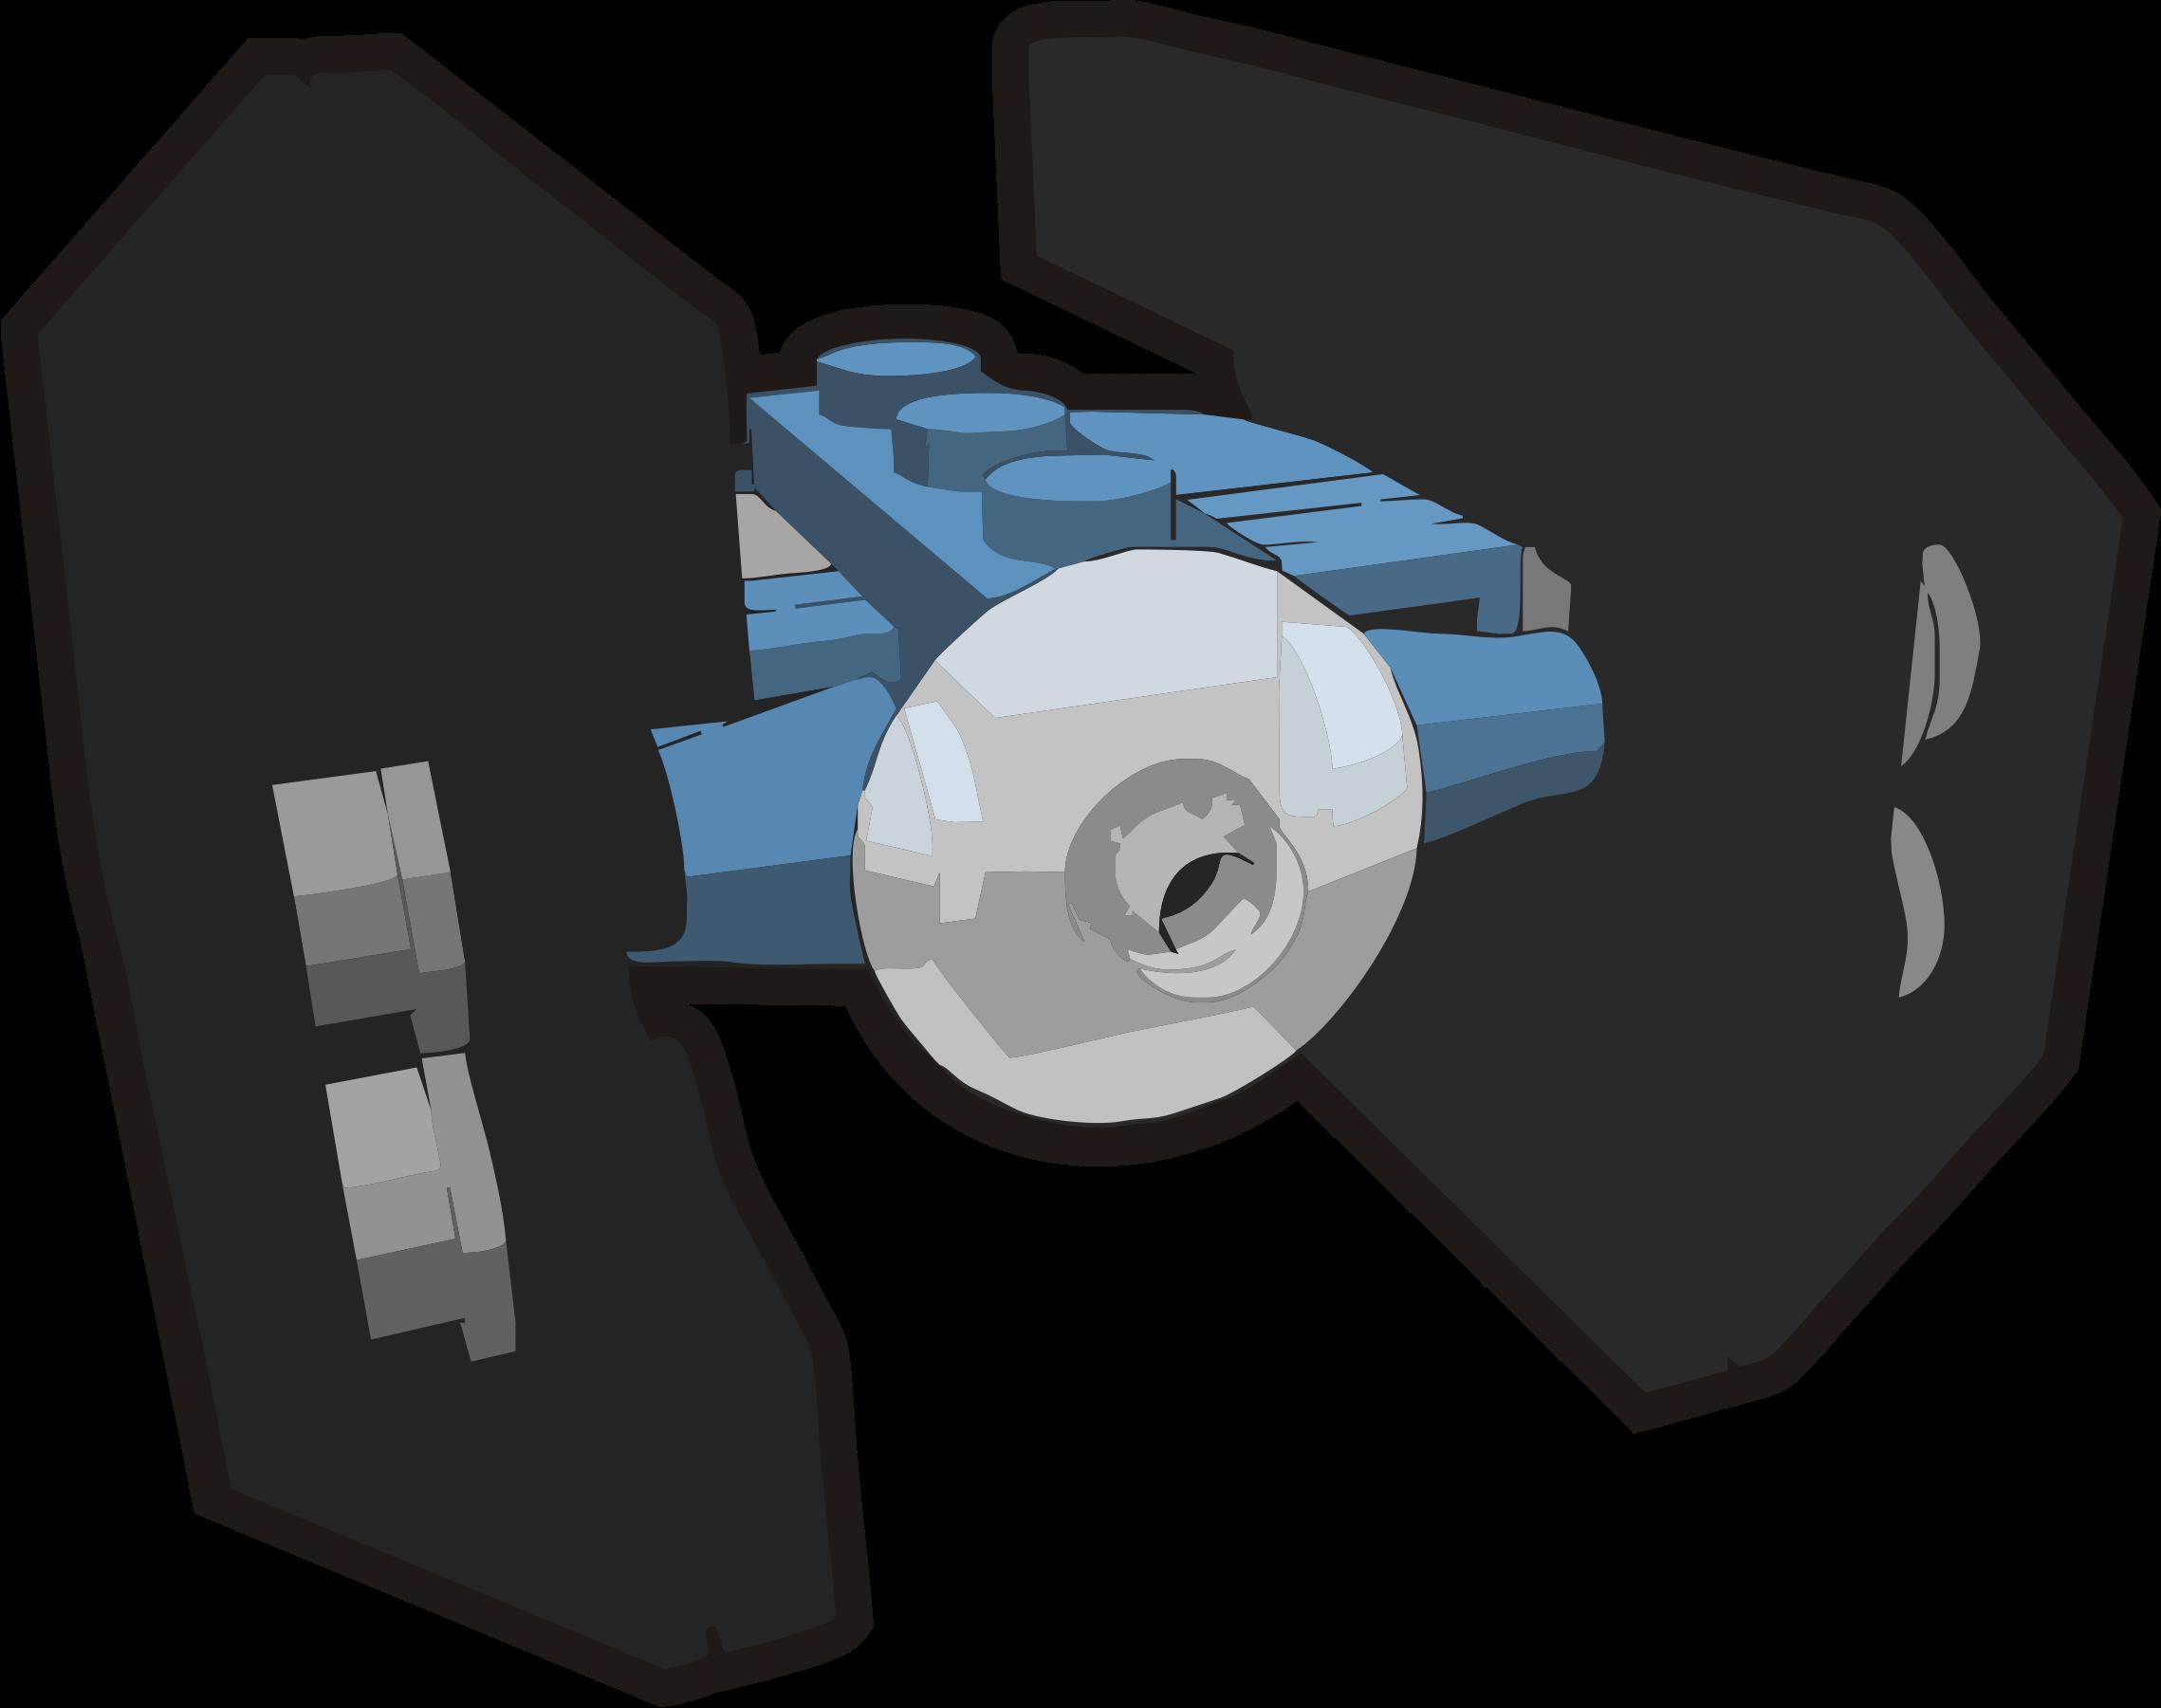 Star wars lego clipart picture transparent Clipart - Clip is a Brick - Star Wars mini Tie Fighter Advanced, set ... picture transparent